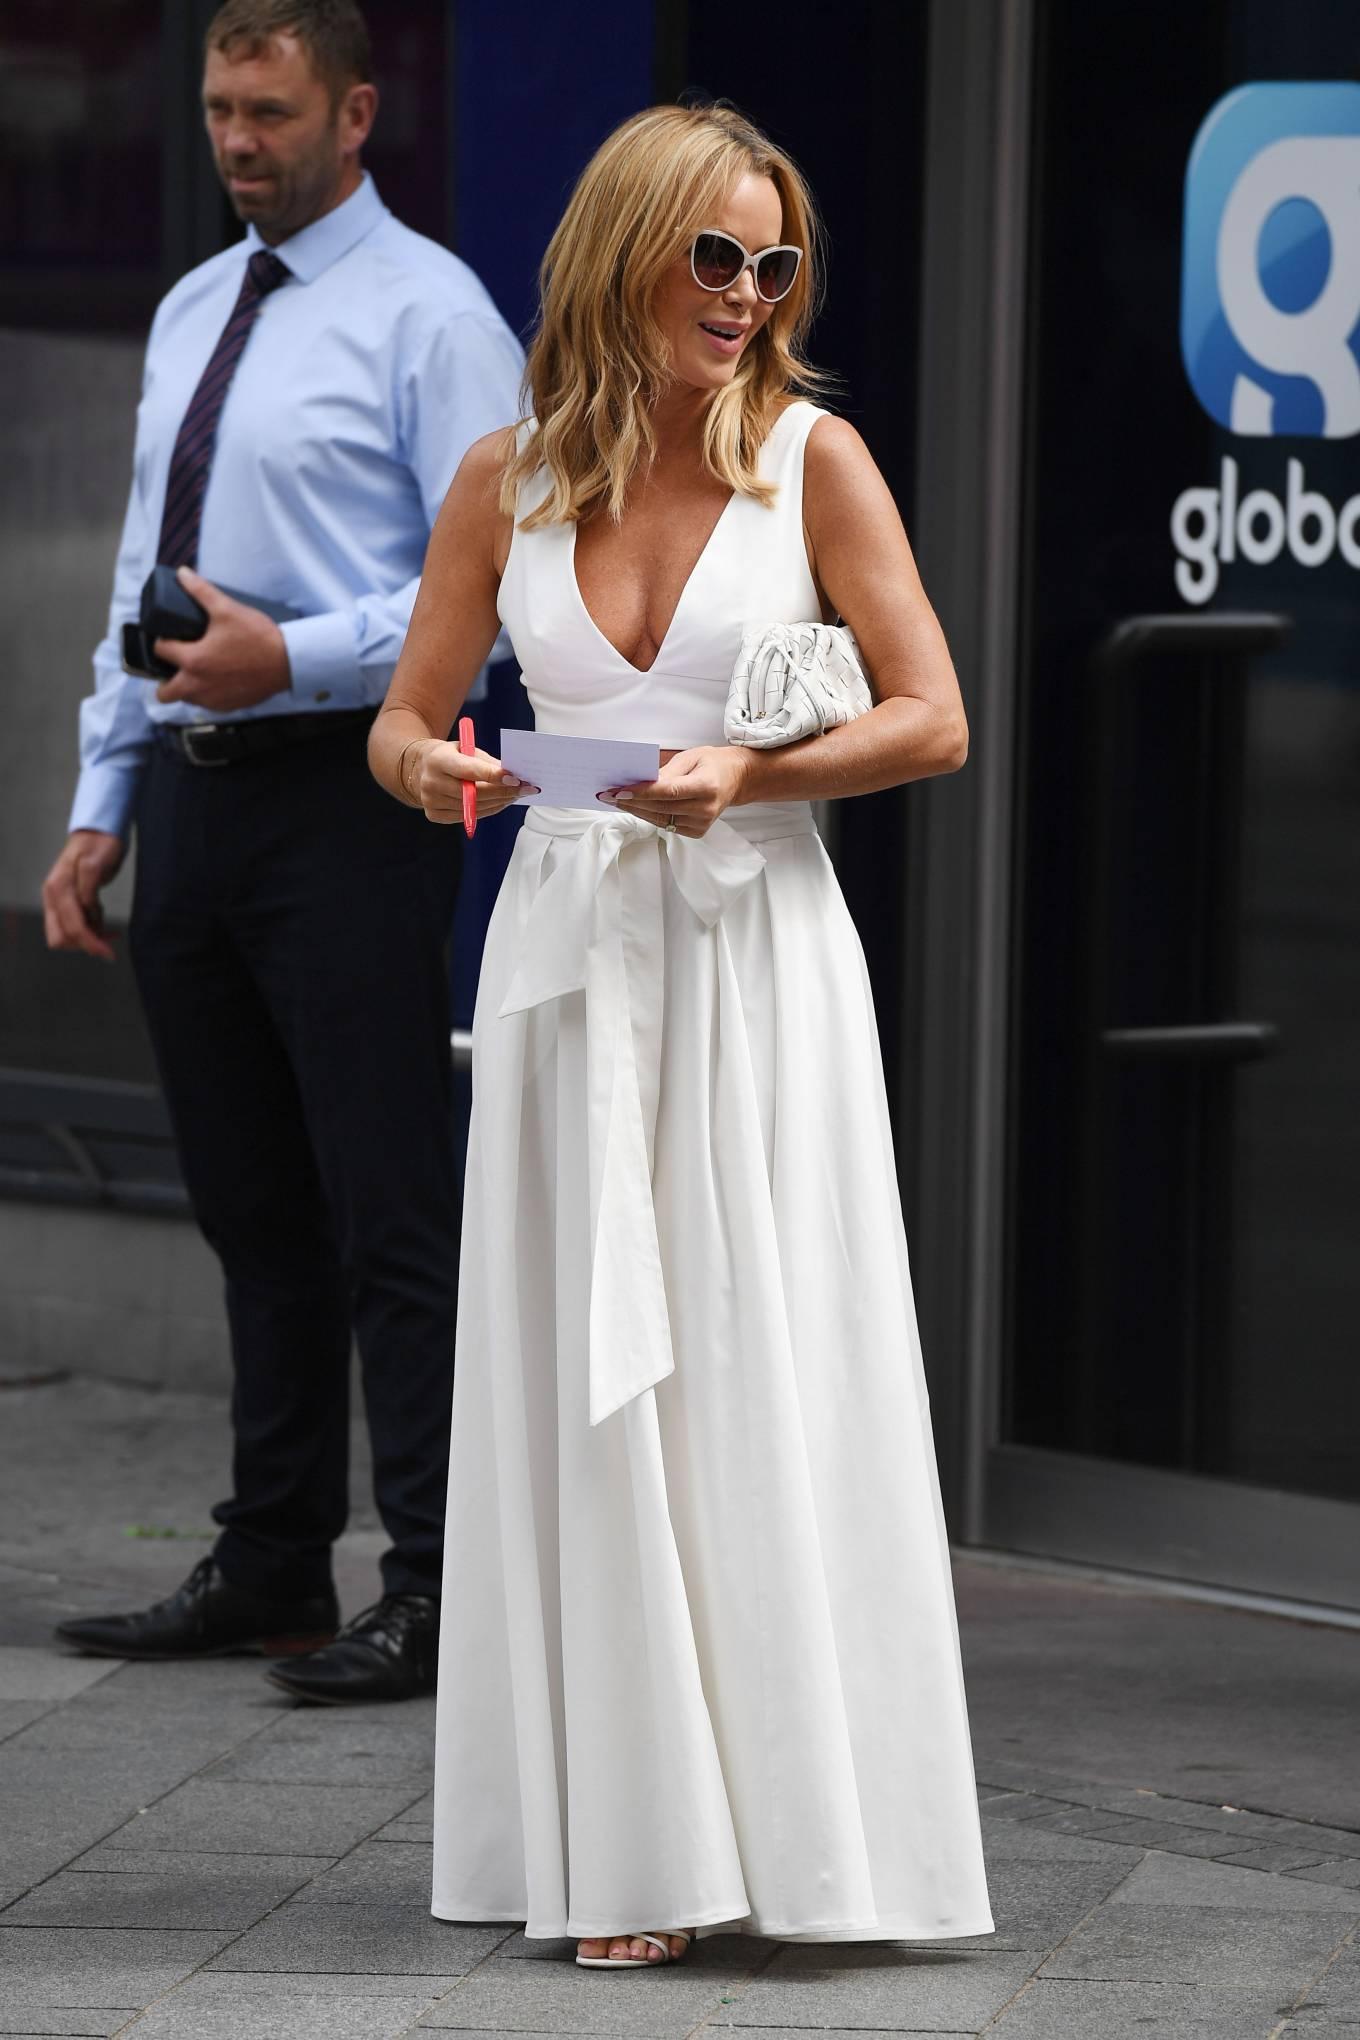 Amanda Holden 2021 : Amanda Holden – In a white dress at Global Studios in London-21